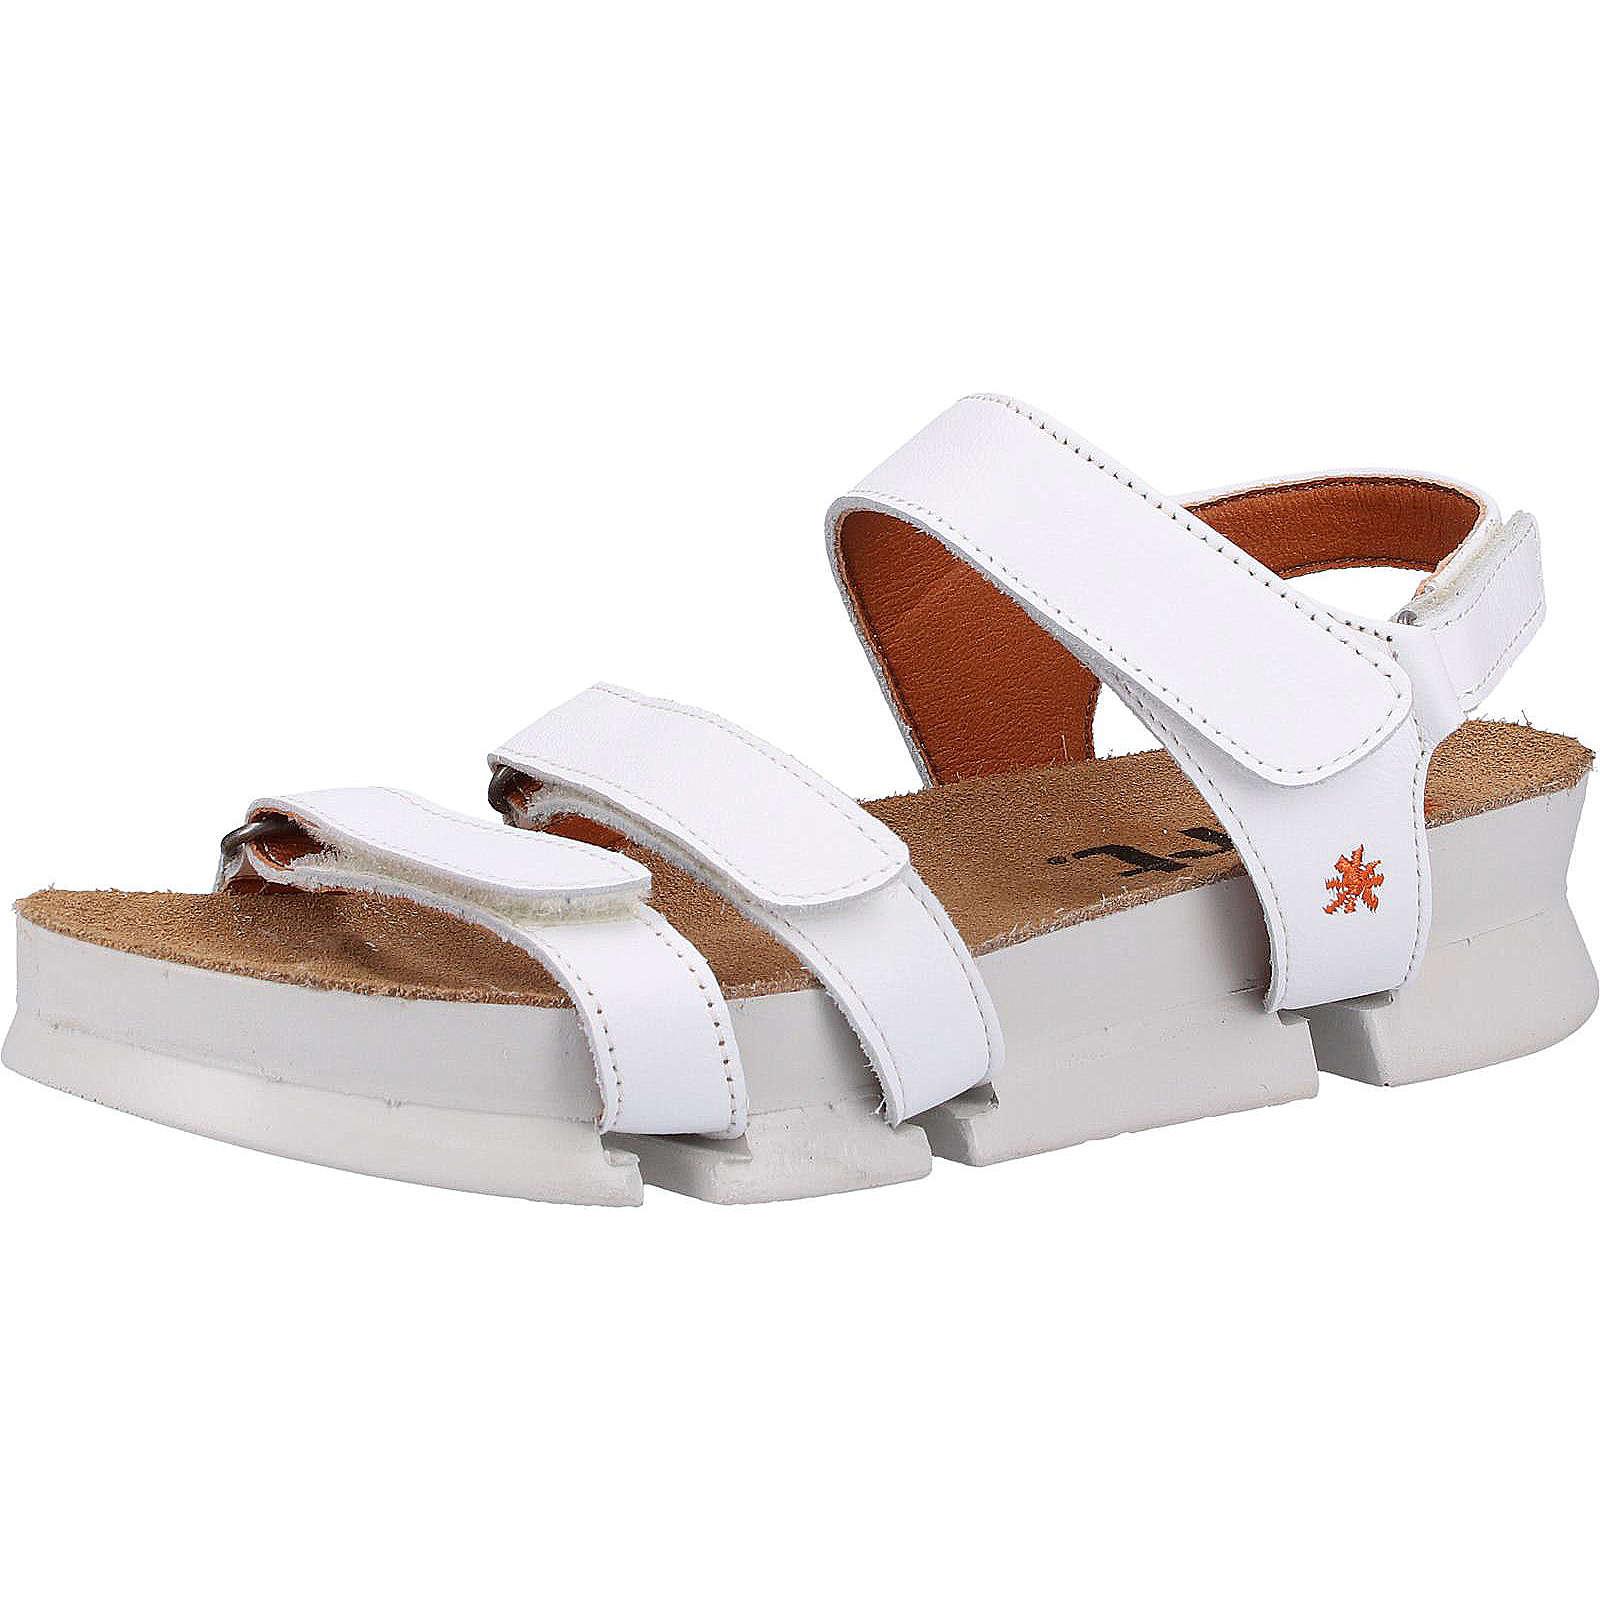 *art Sandalen Klassische Sandaletten weiß Damen Gr. 37